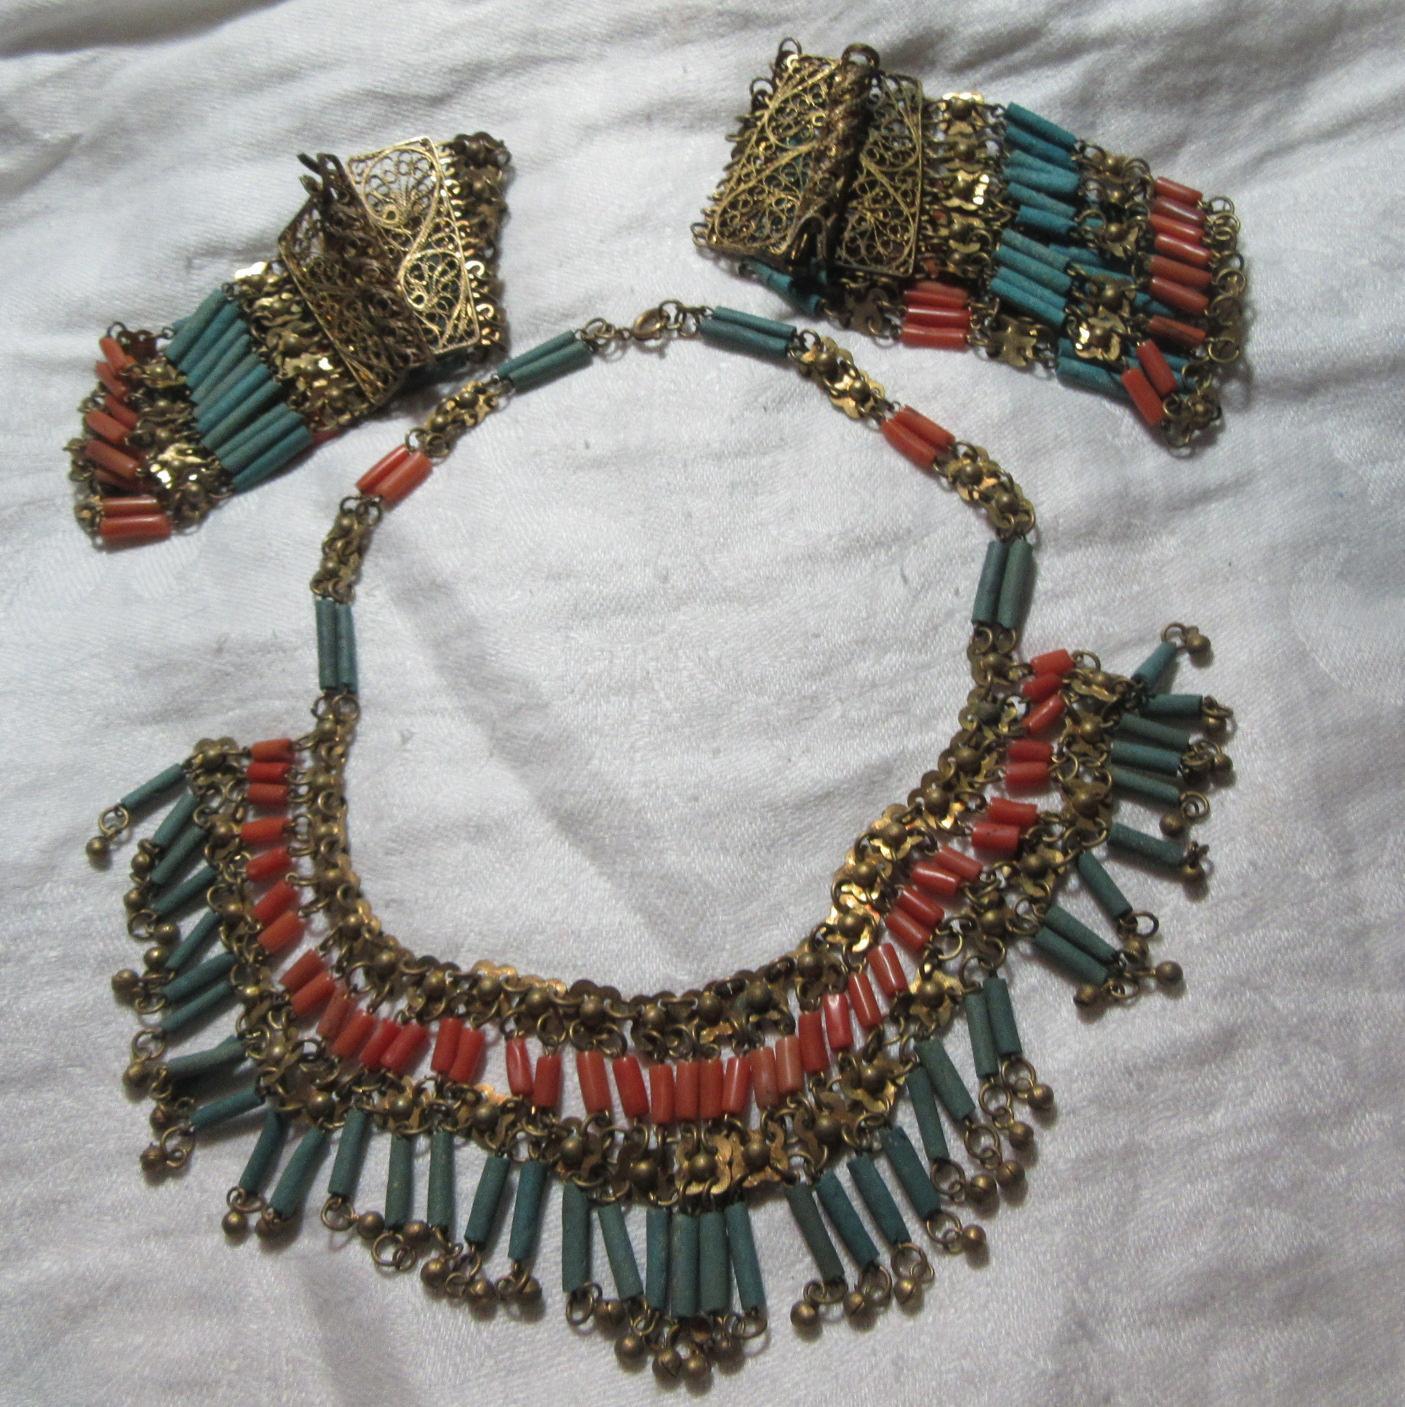 Rare Vintage Egyptian Revival Necklace and 2 Bracelets Set Jewelry